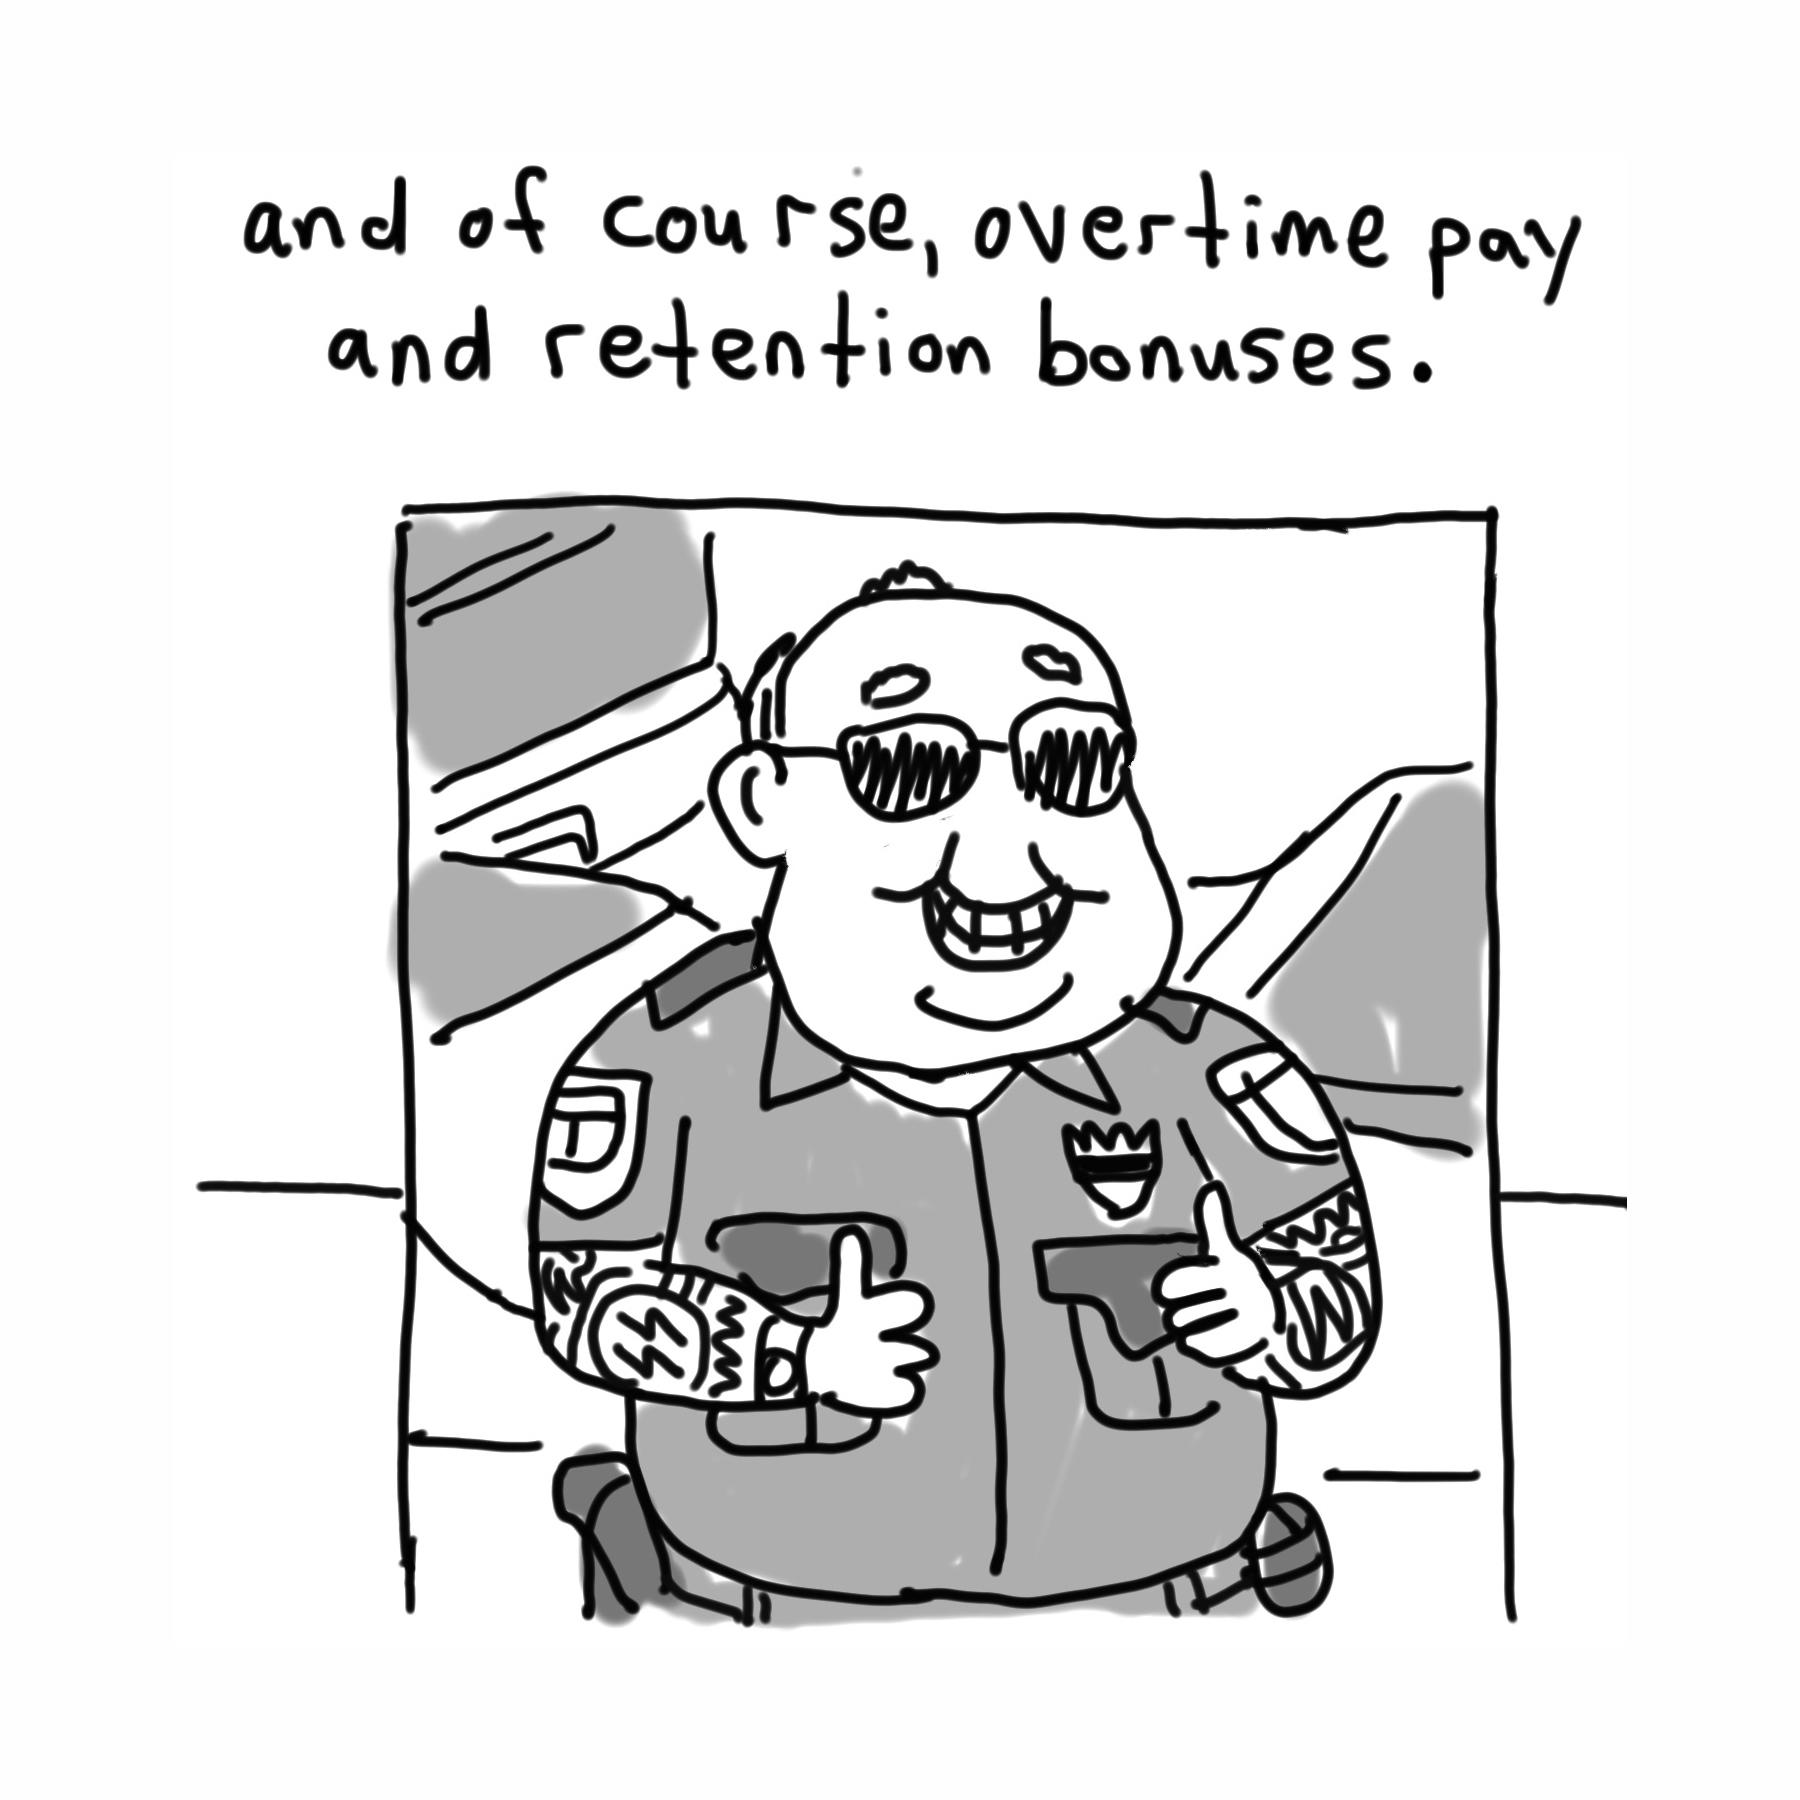 8control